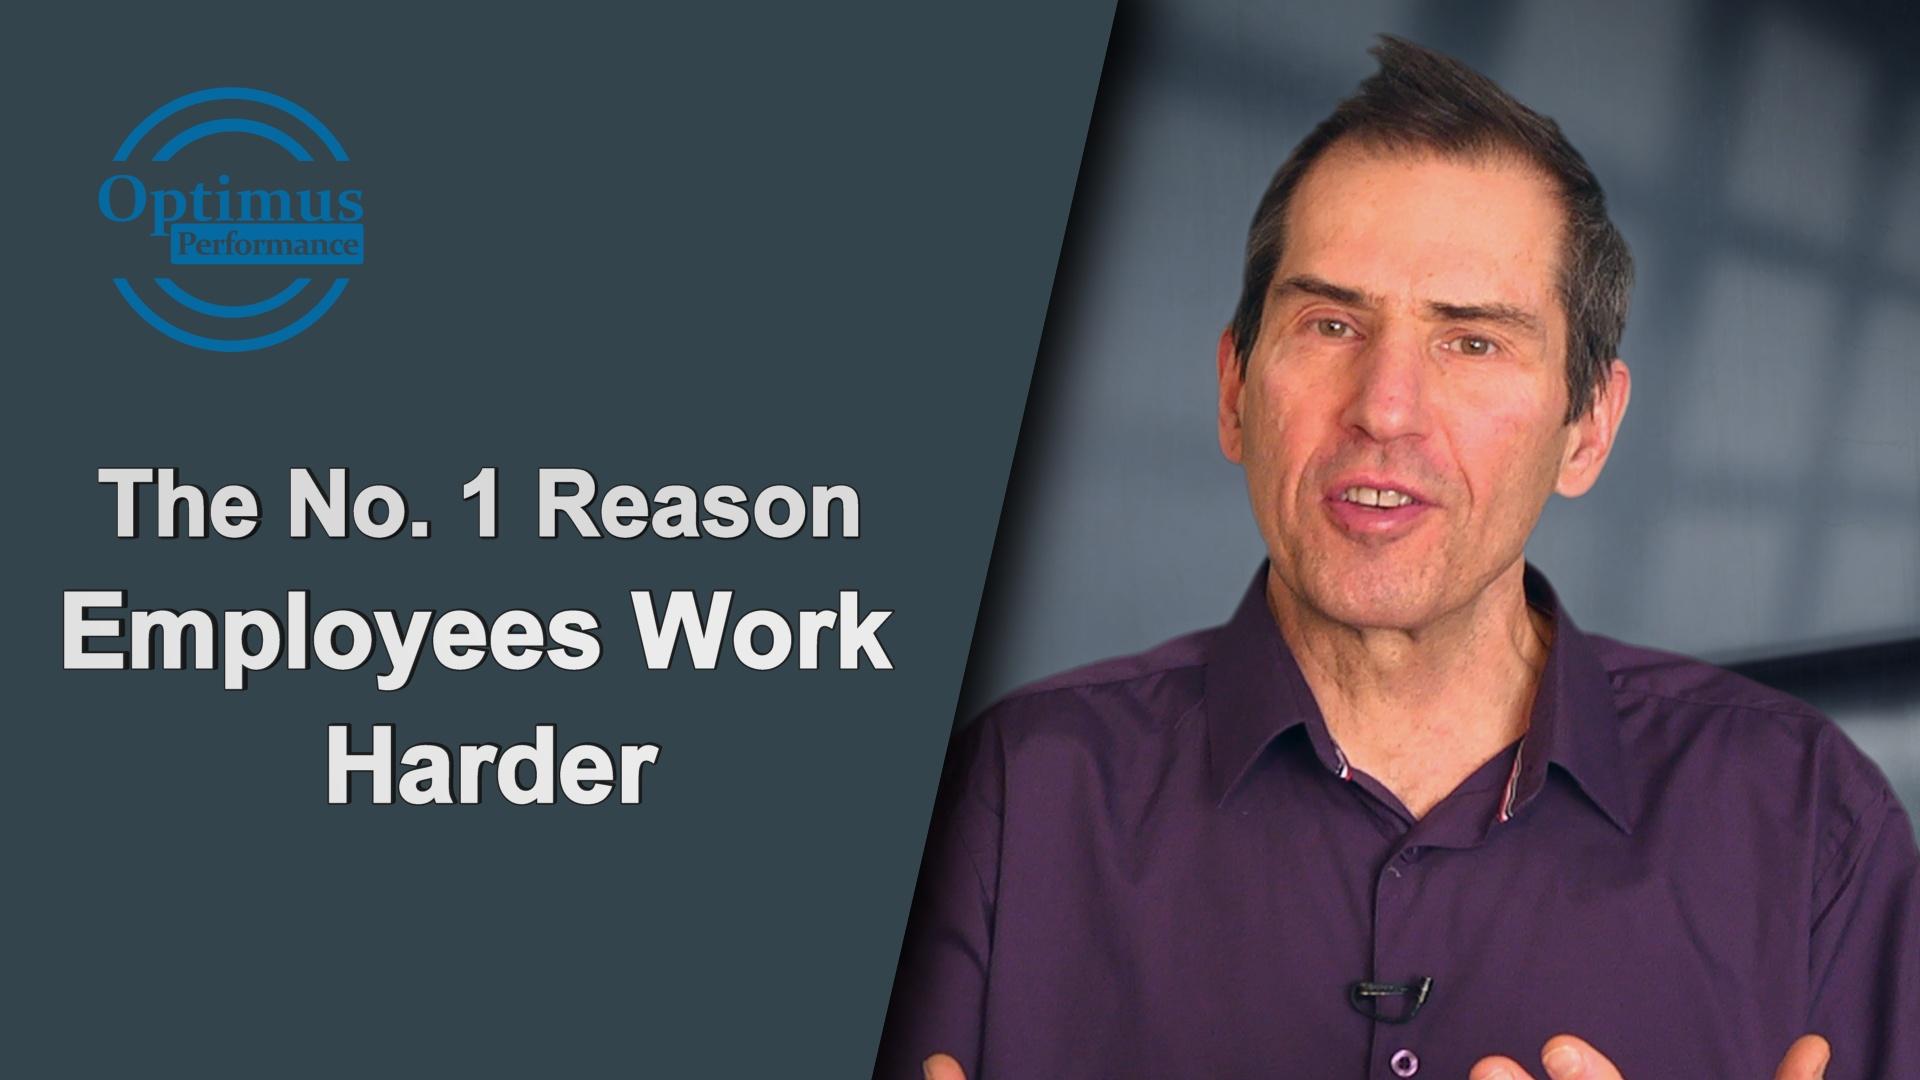 makes employees work harder